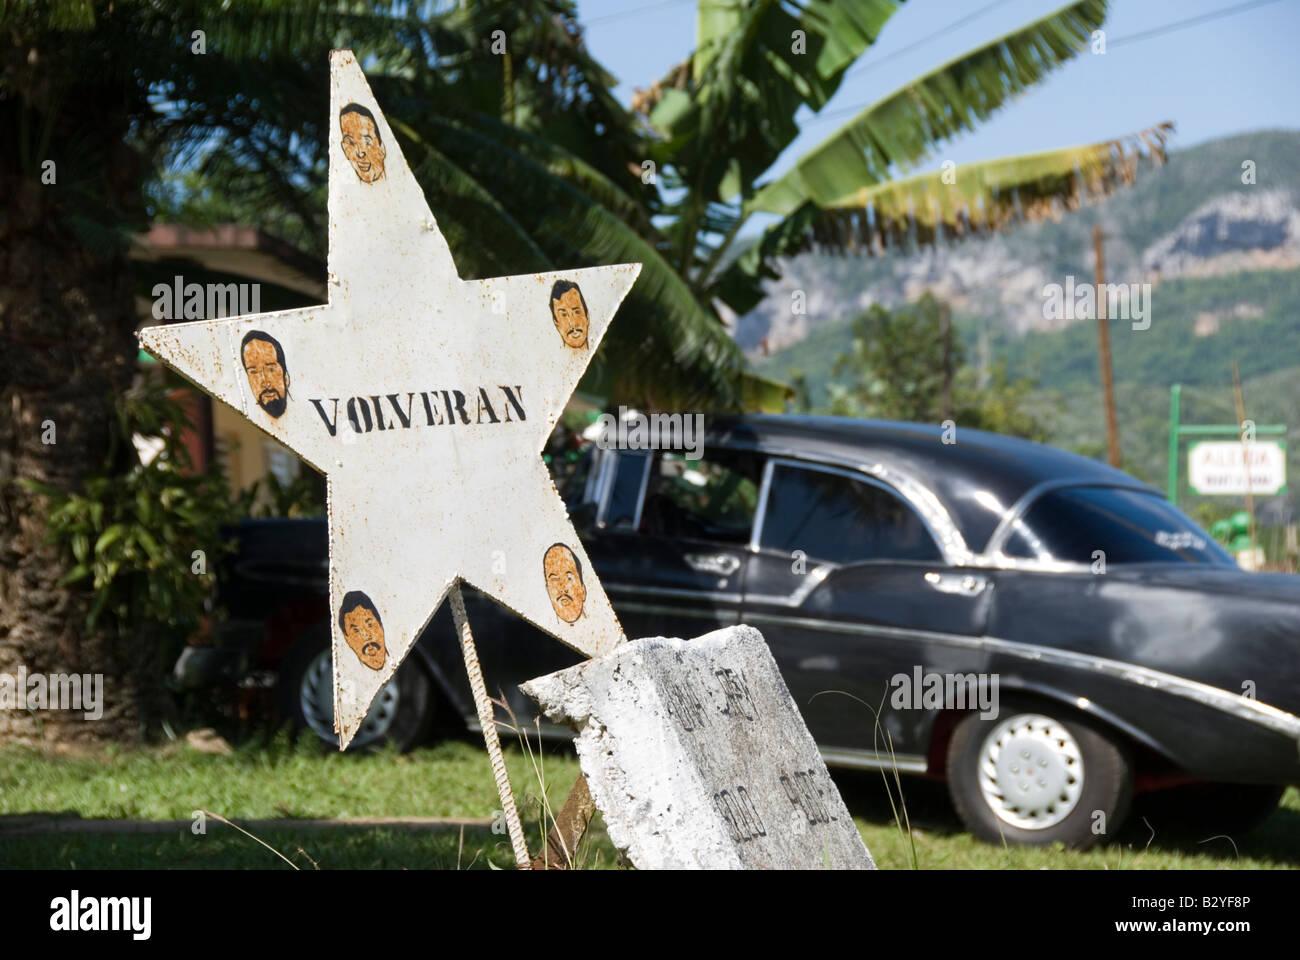 Hommage an die kubanische fünf Los Cincos Volveran. Kuba Stockbild